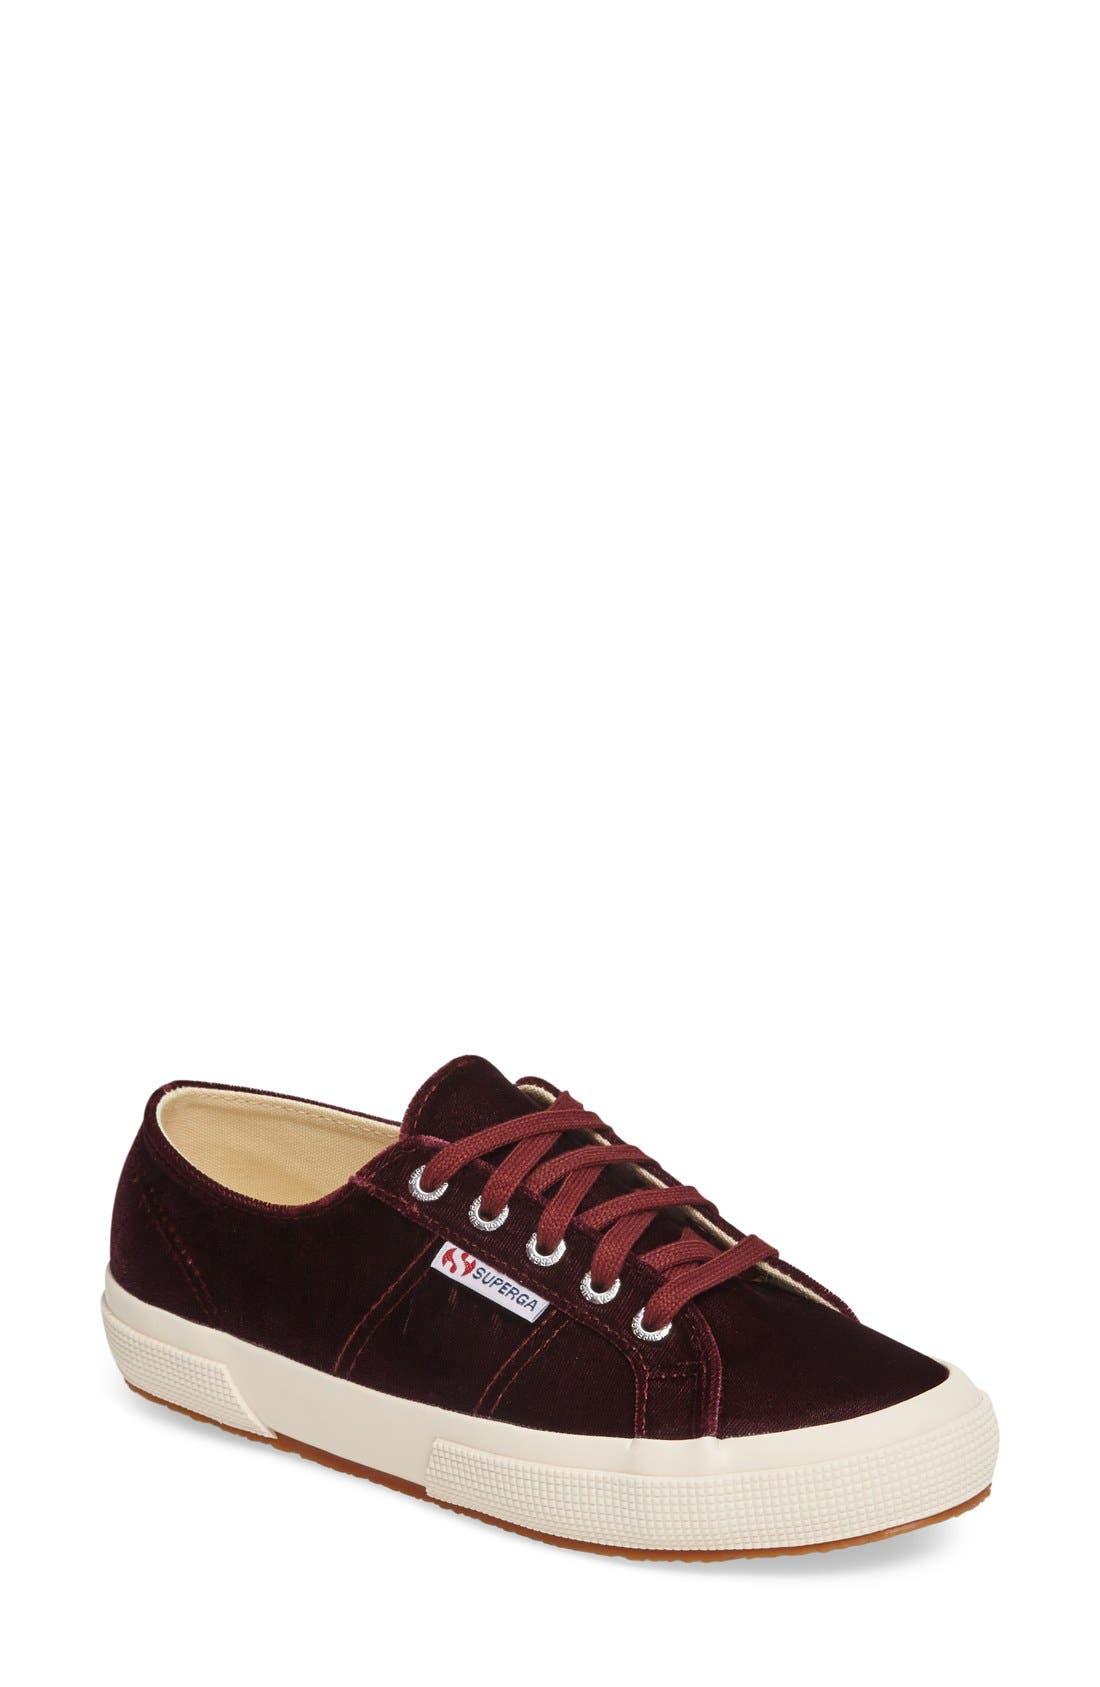 Superga 2750 Lace-Up Sneaker (Women)